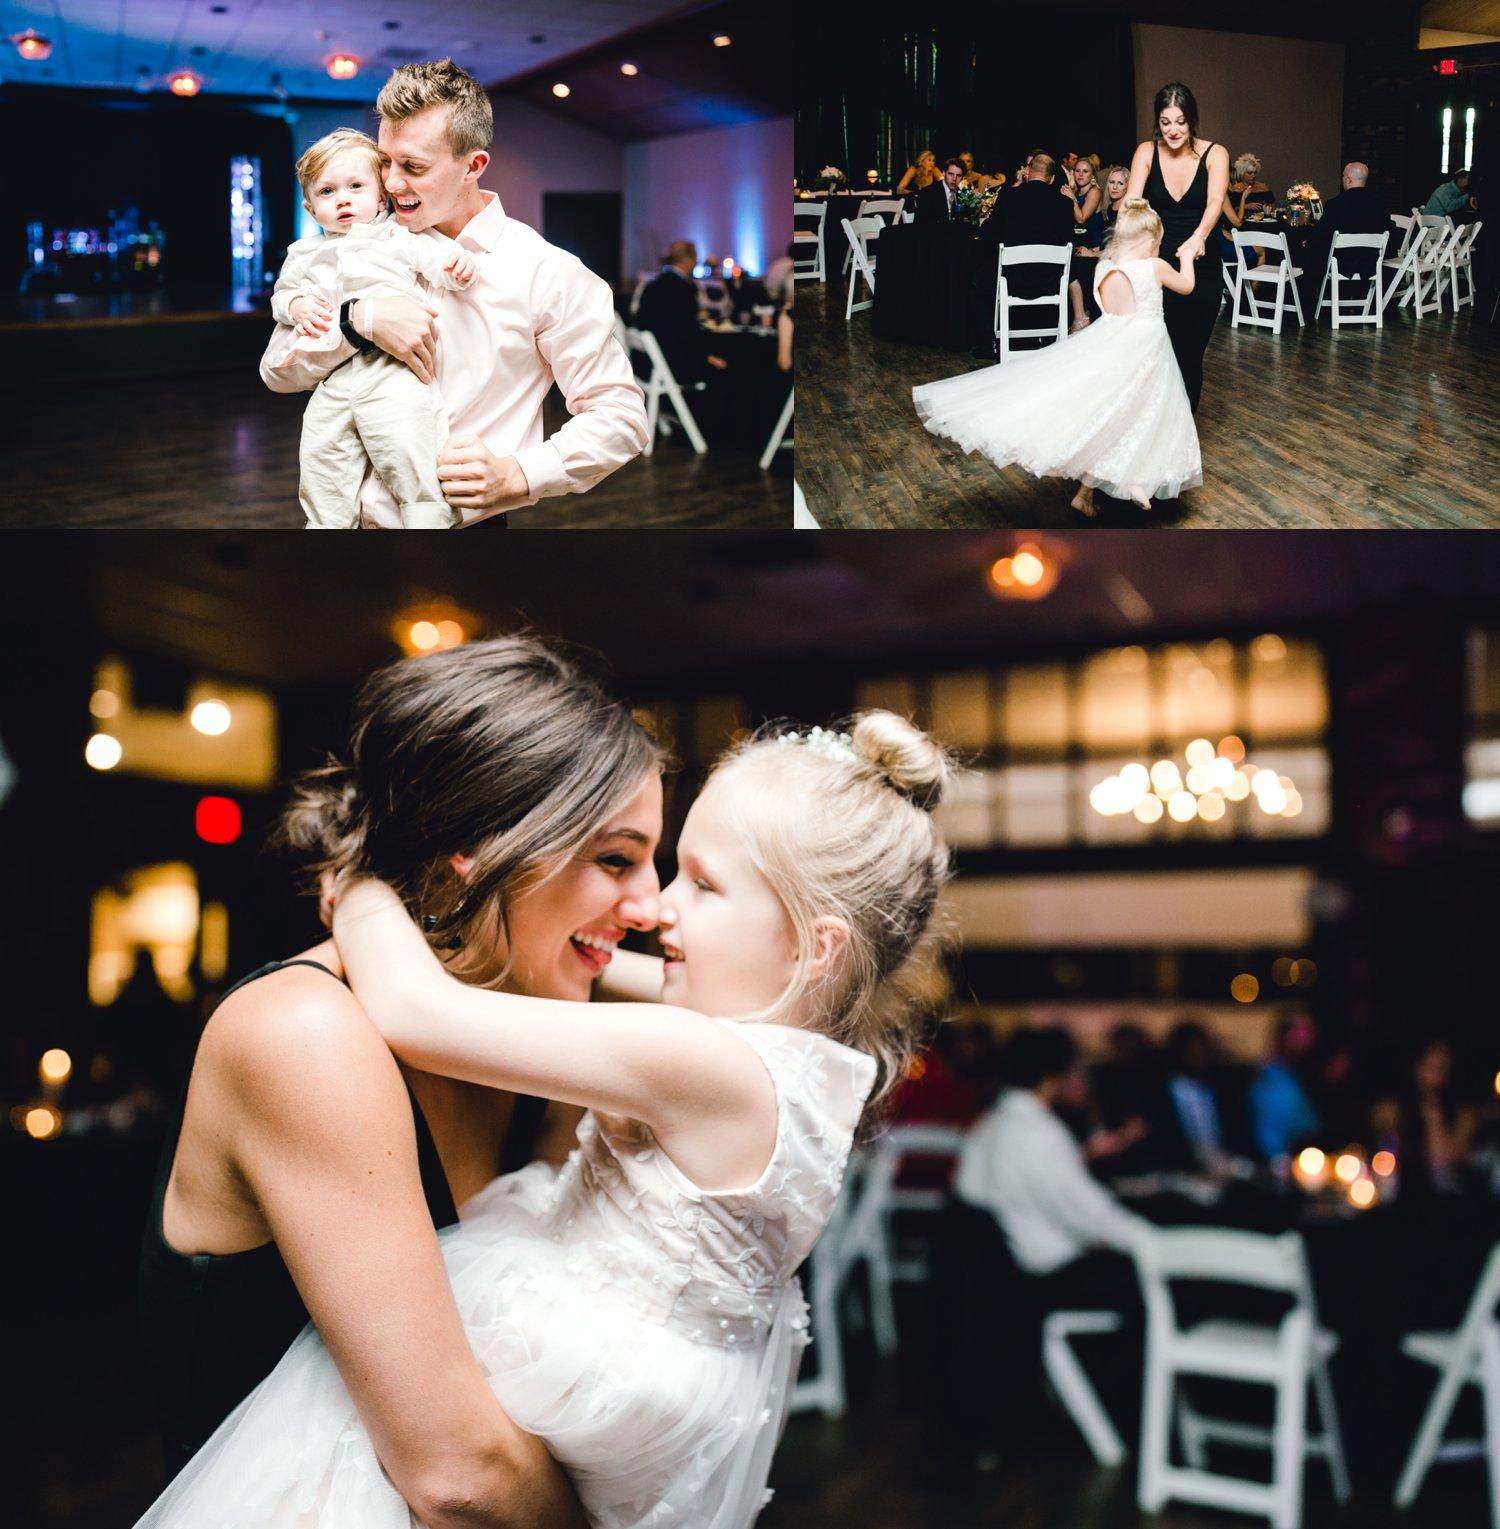 Hunter_and_Molly_Rawls_ALLEEJ_Lubbock_WEDDING_Legacy_Event_Center_0185.jpg